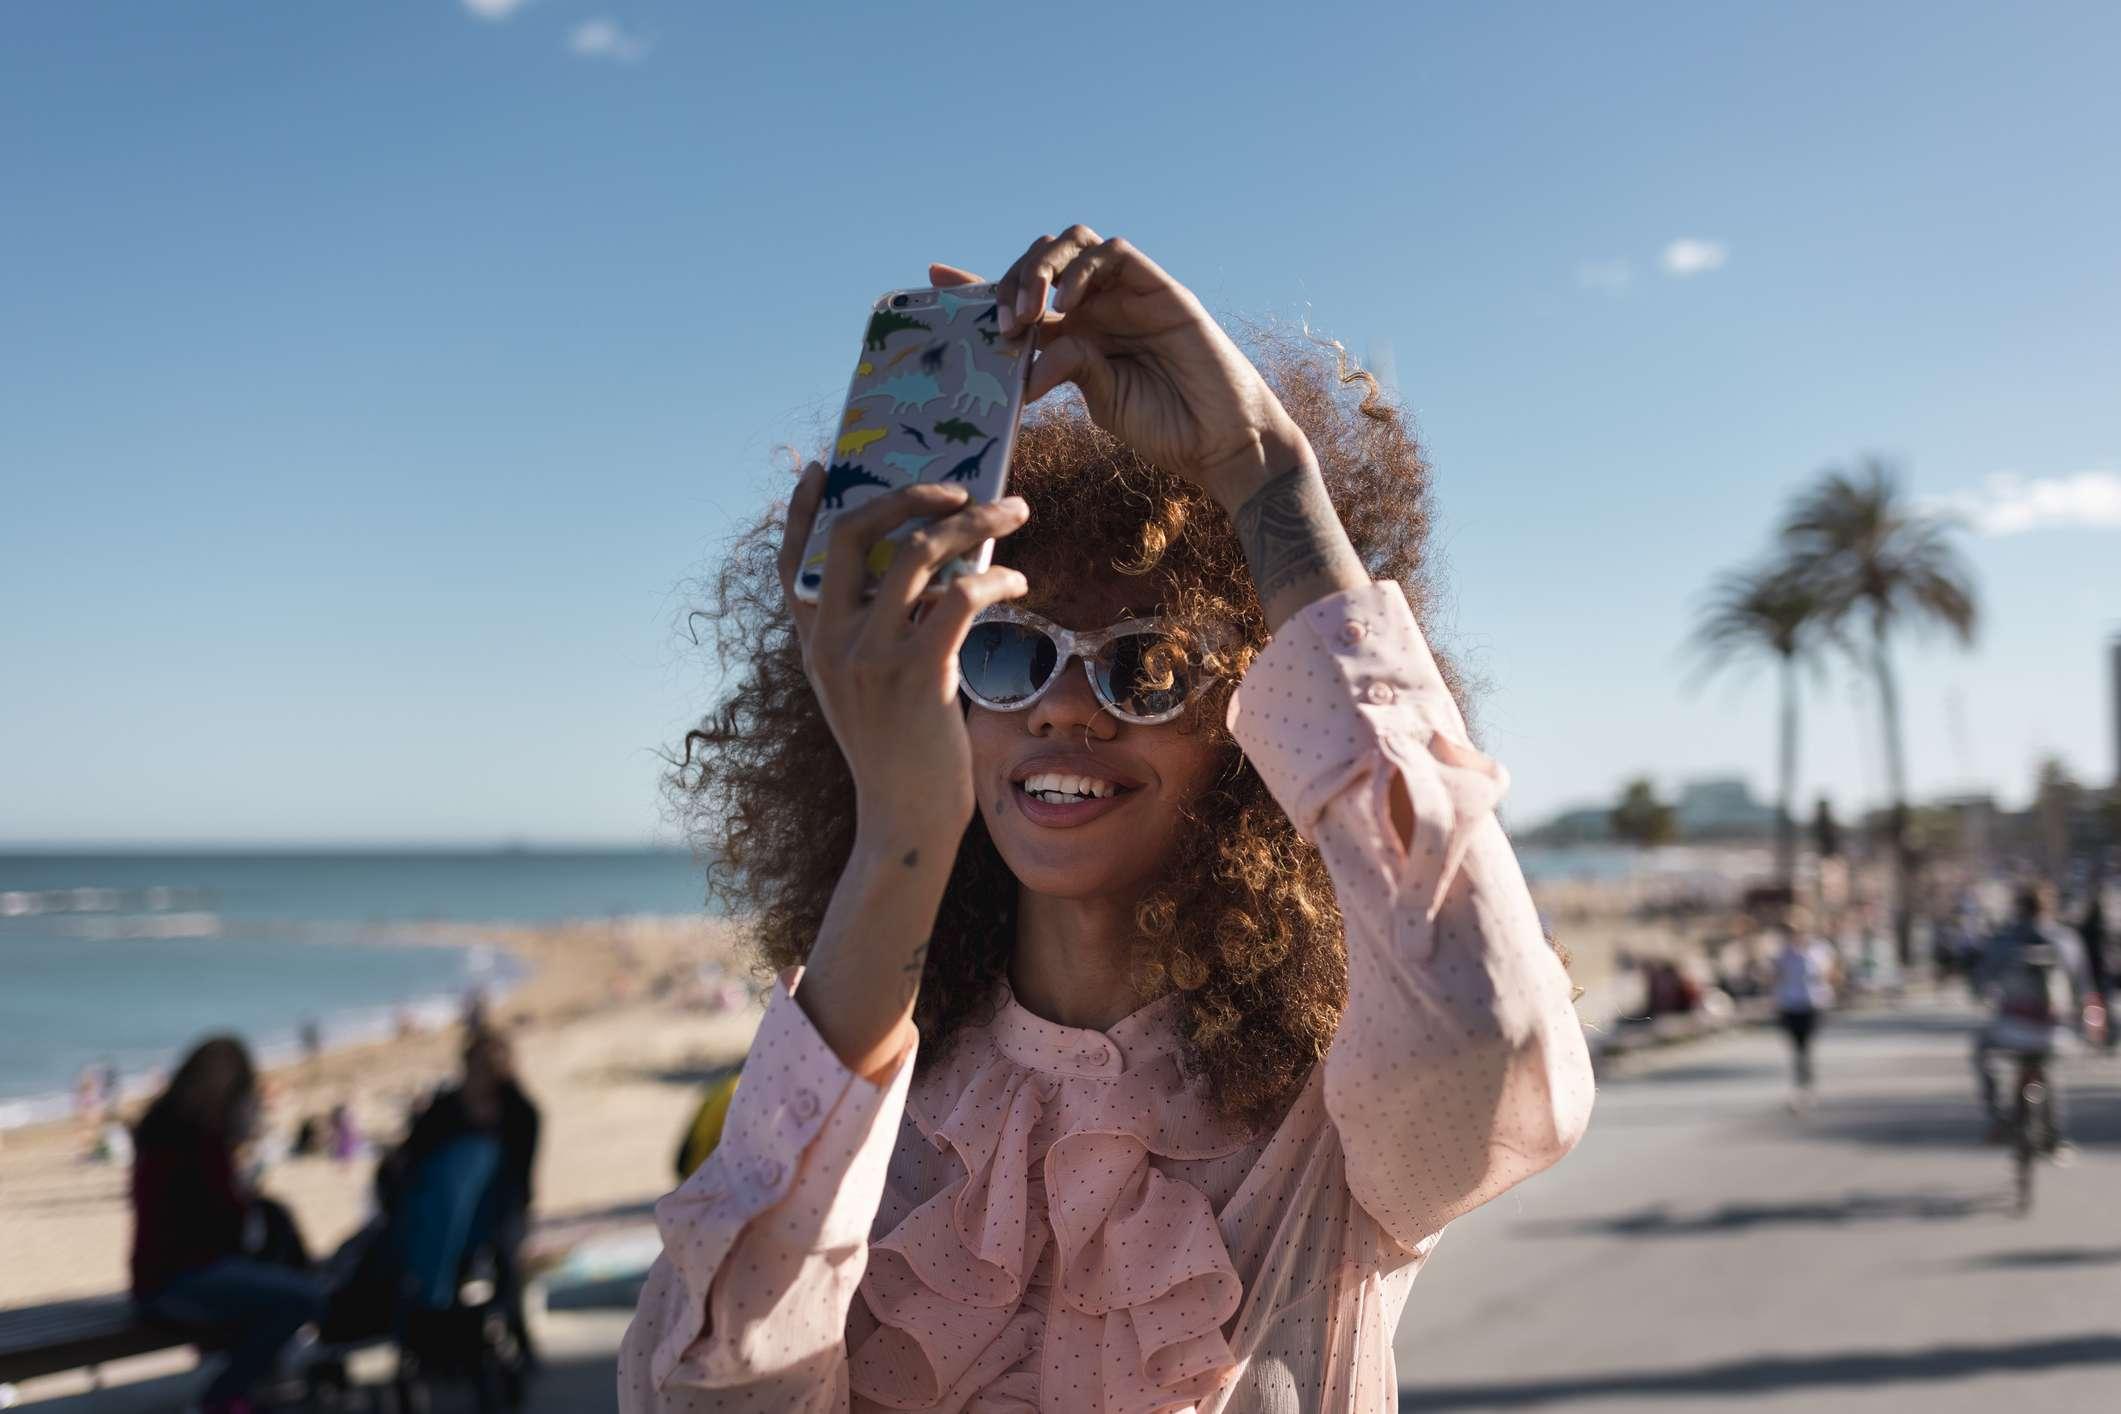 Someone taking selfies at a seaside promenade.